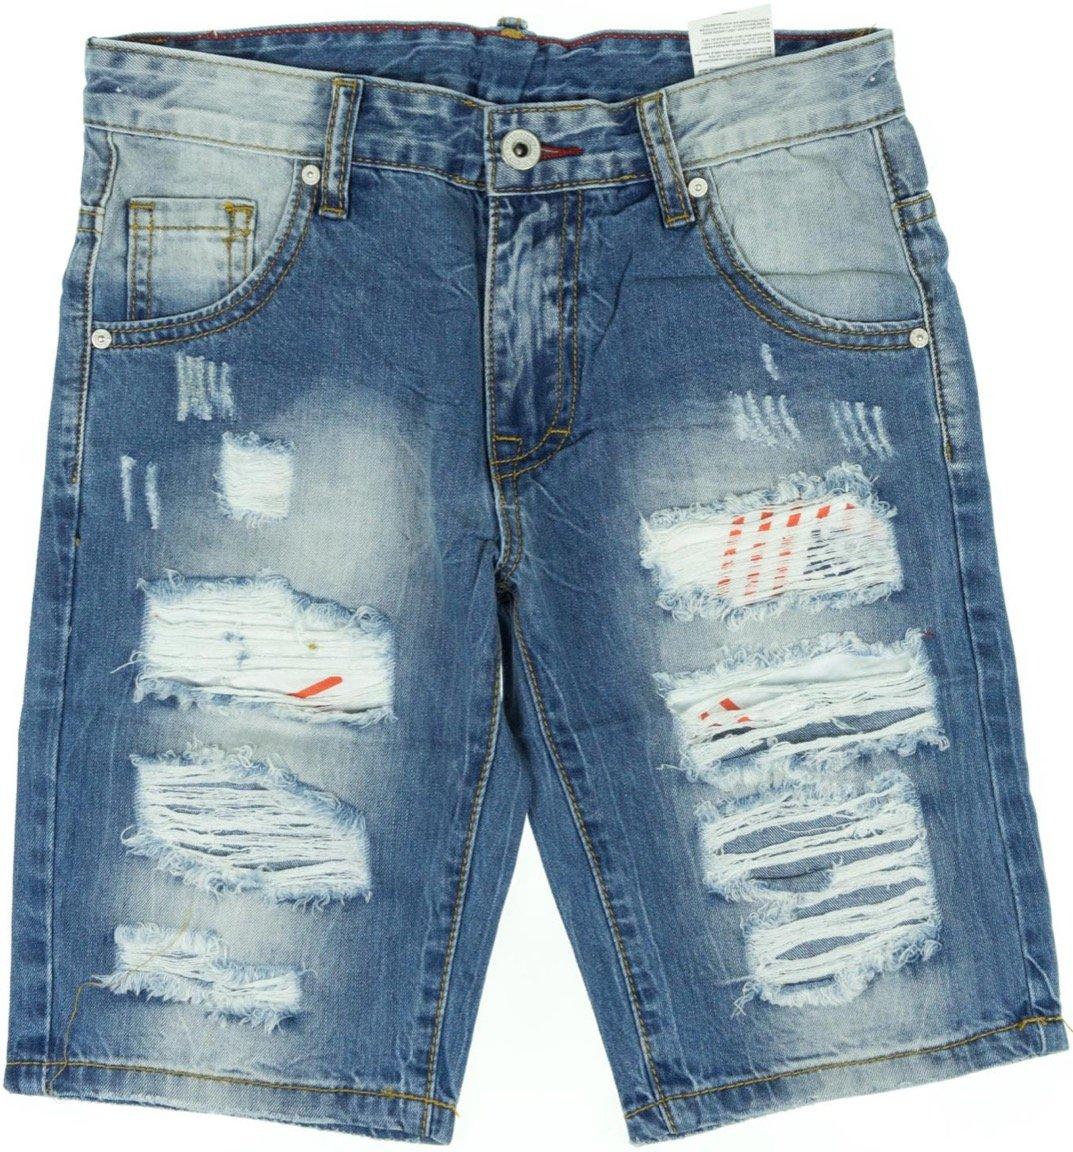 "Boy Studio παιδικό παντελόνι βερμούδα τζιν ""Teared"""